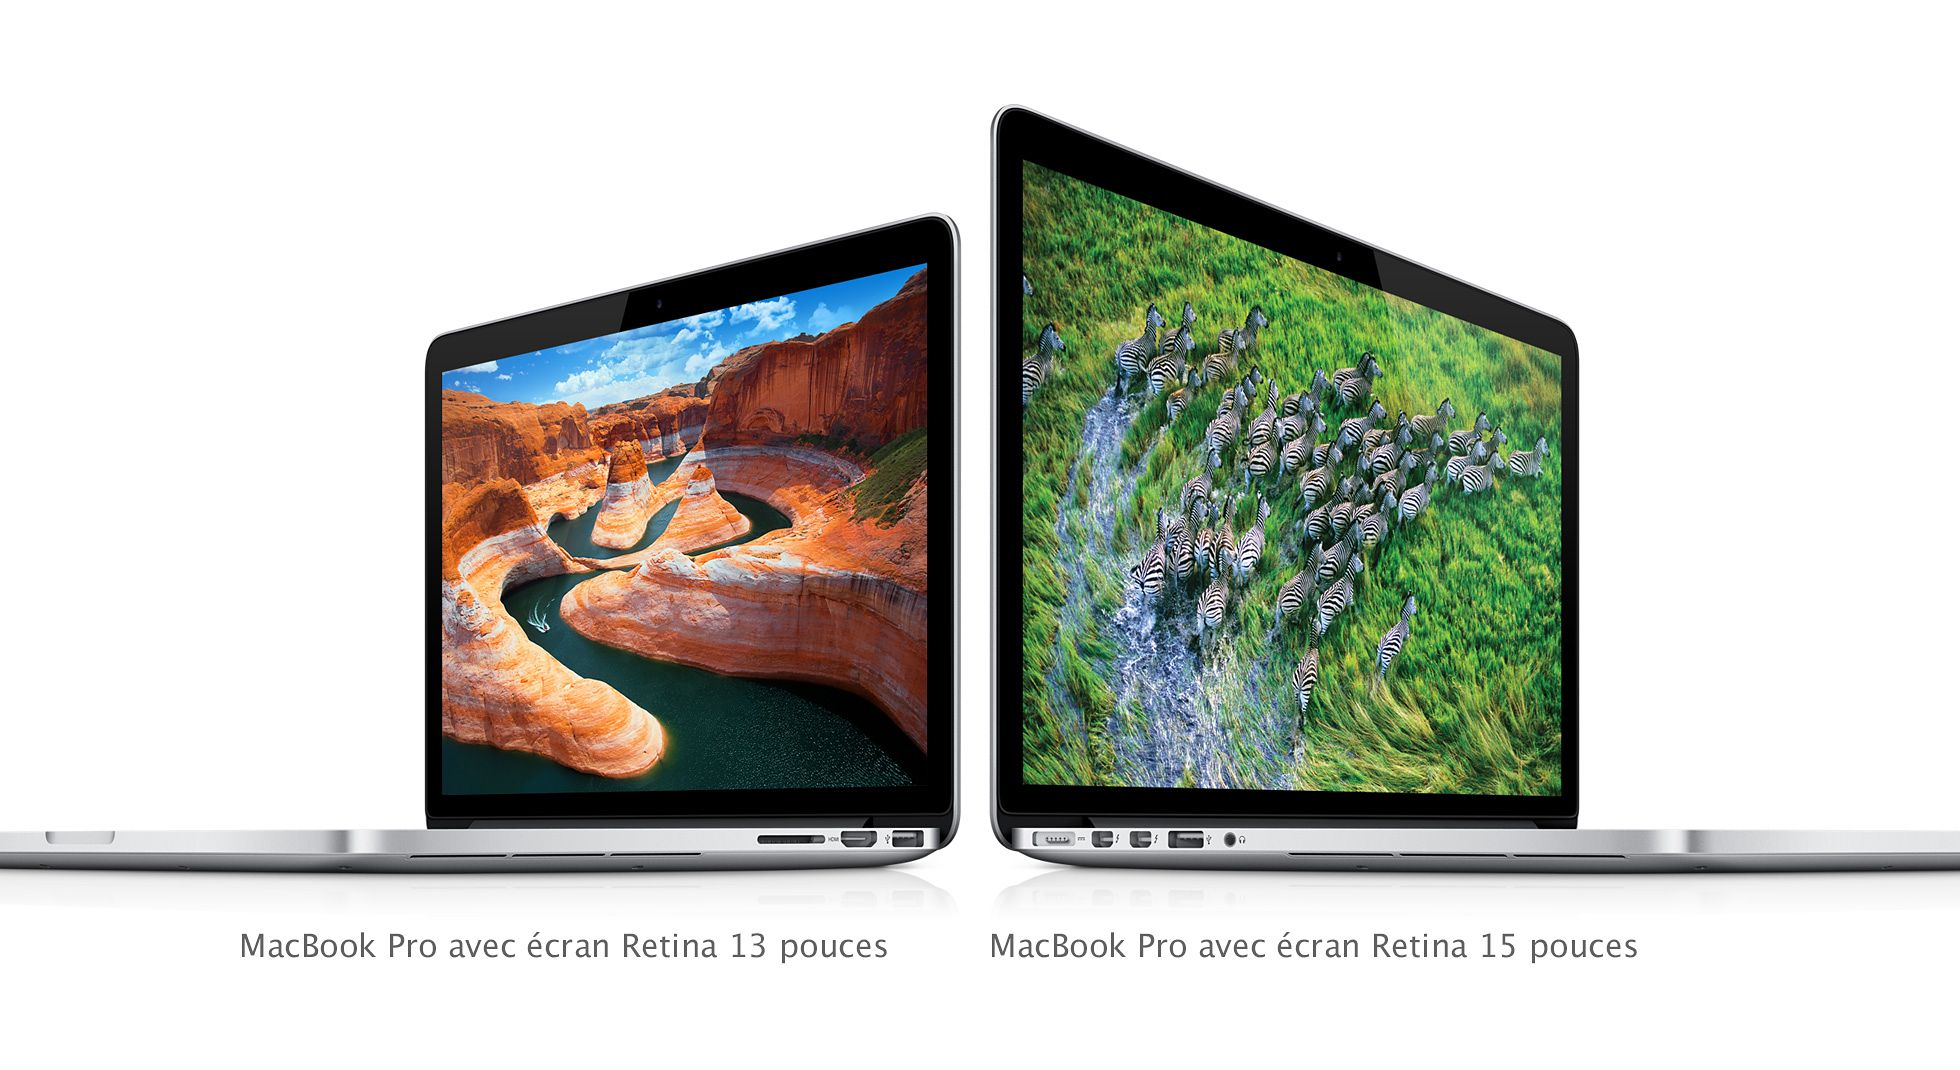 macbook-pro-retina-13-pouces-4